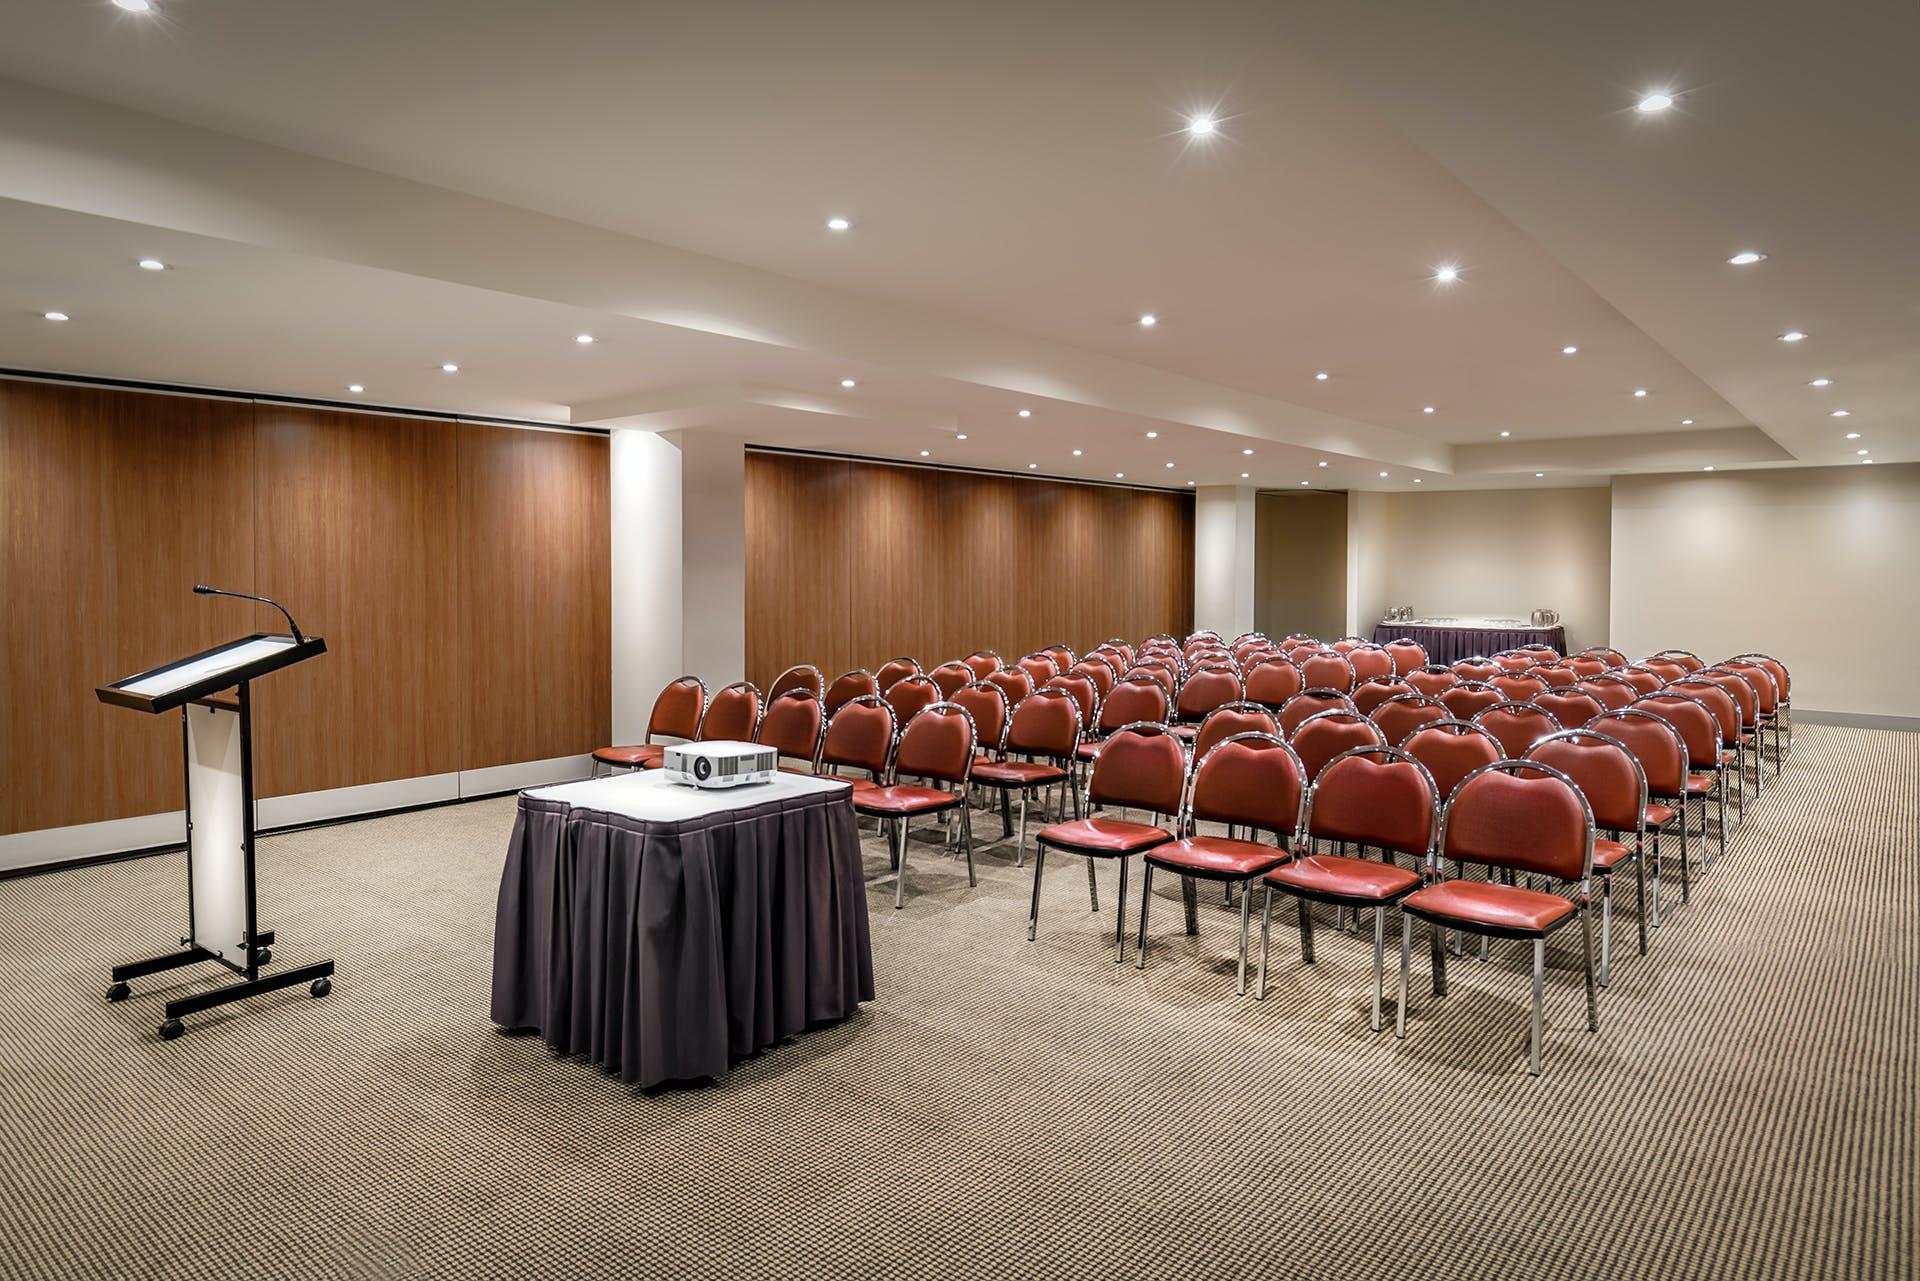 Robert Burke Room, meeting room at Batman's Hill on Collins, image 1